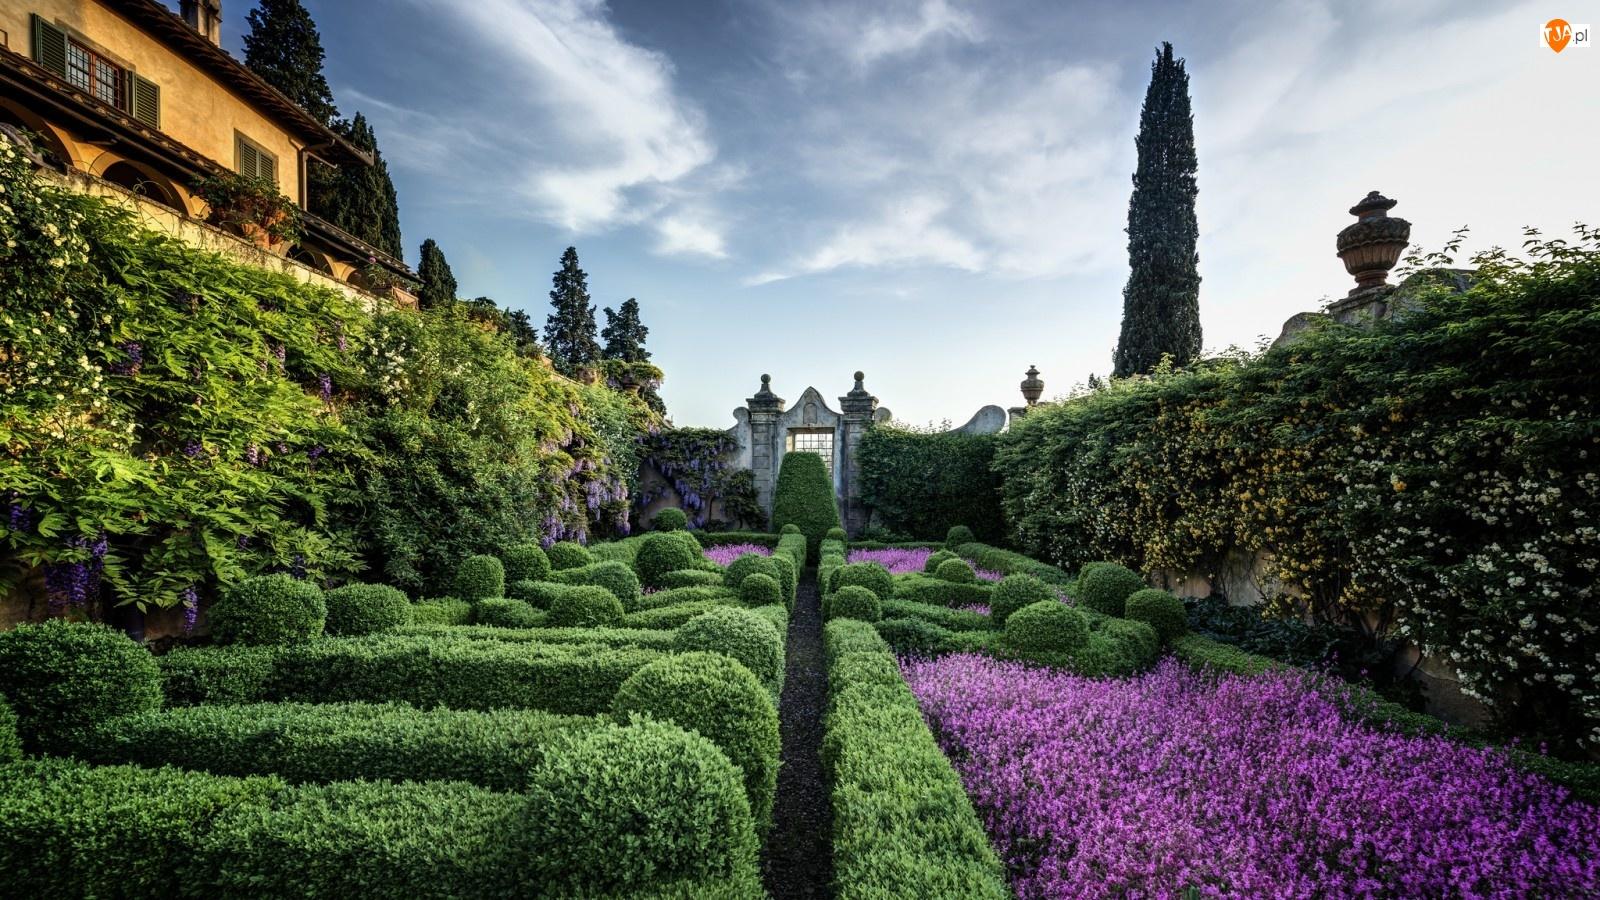 Willa, Ogród, Zieleń